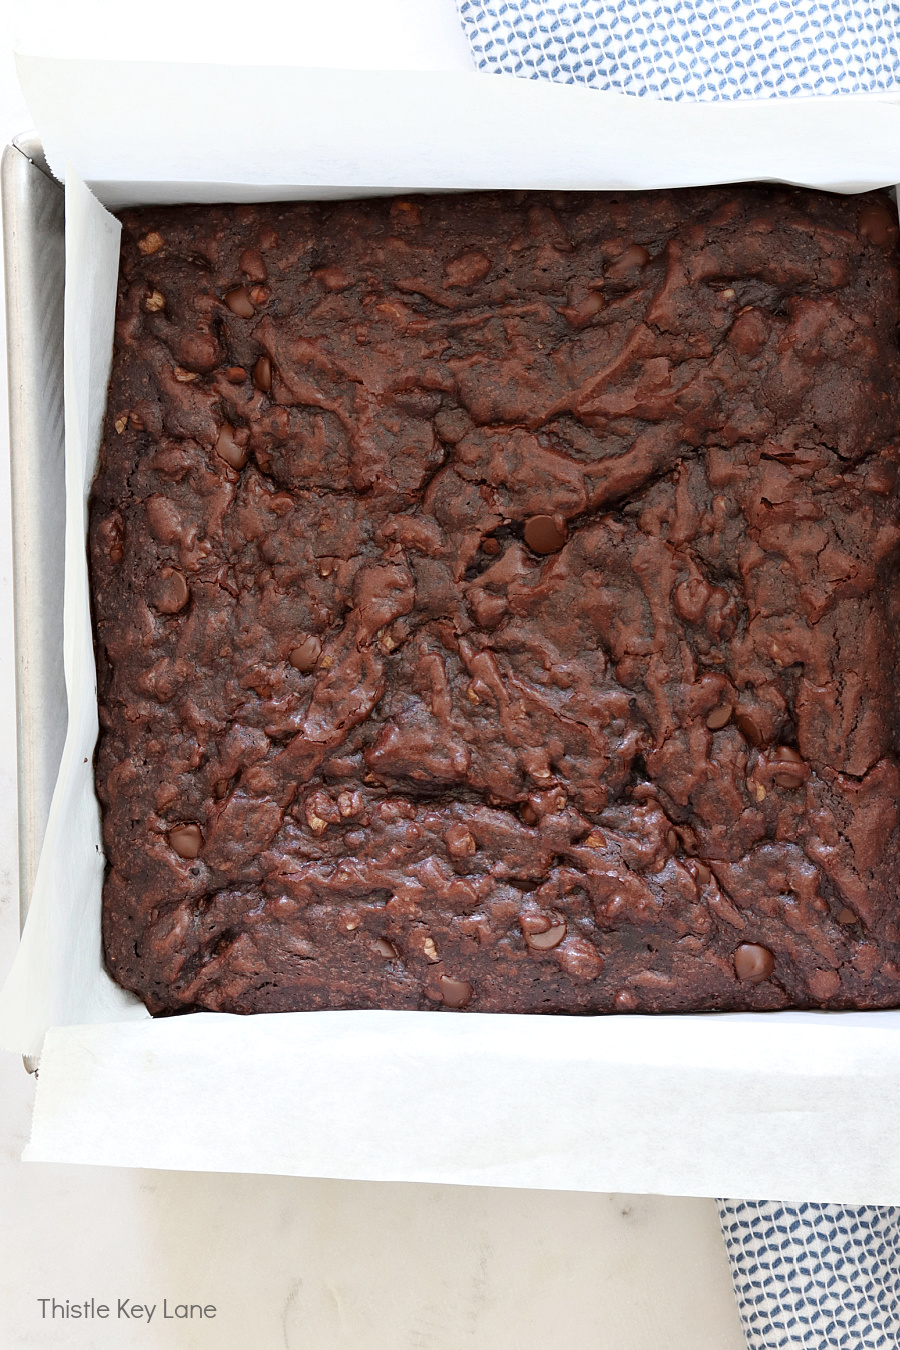 Parchment lined pan holding brownies. Dark Chocolate Fudge Brownie Recipe.